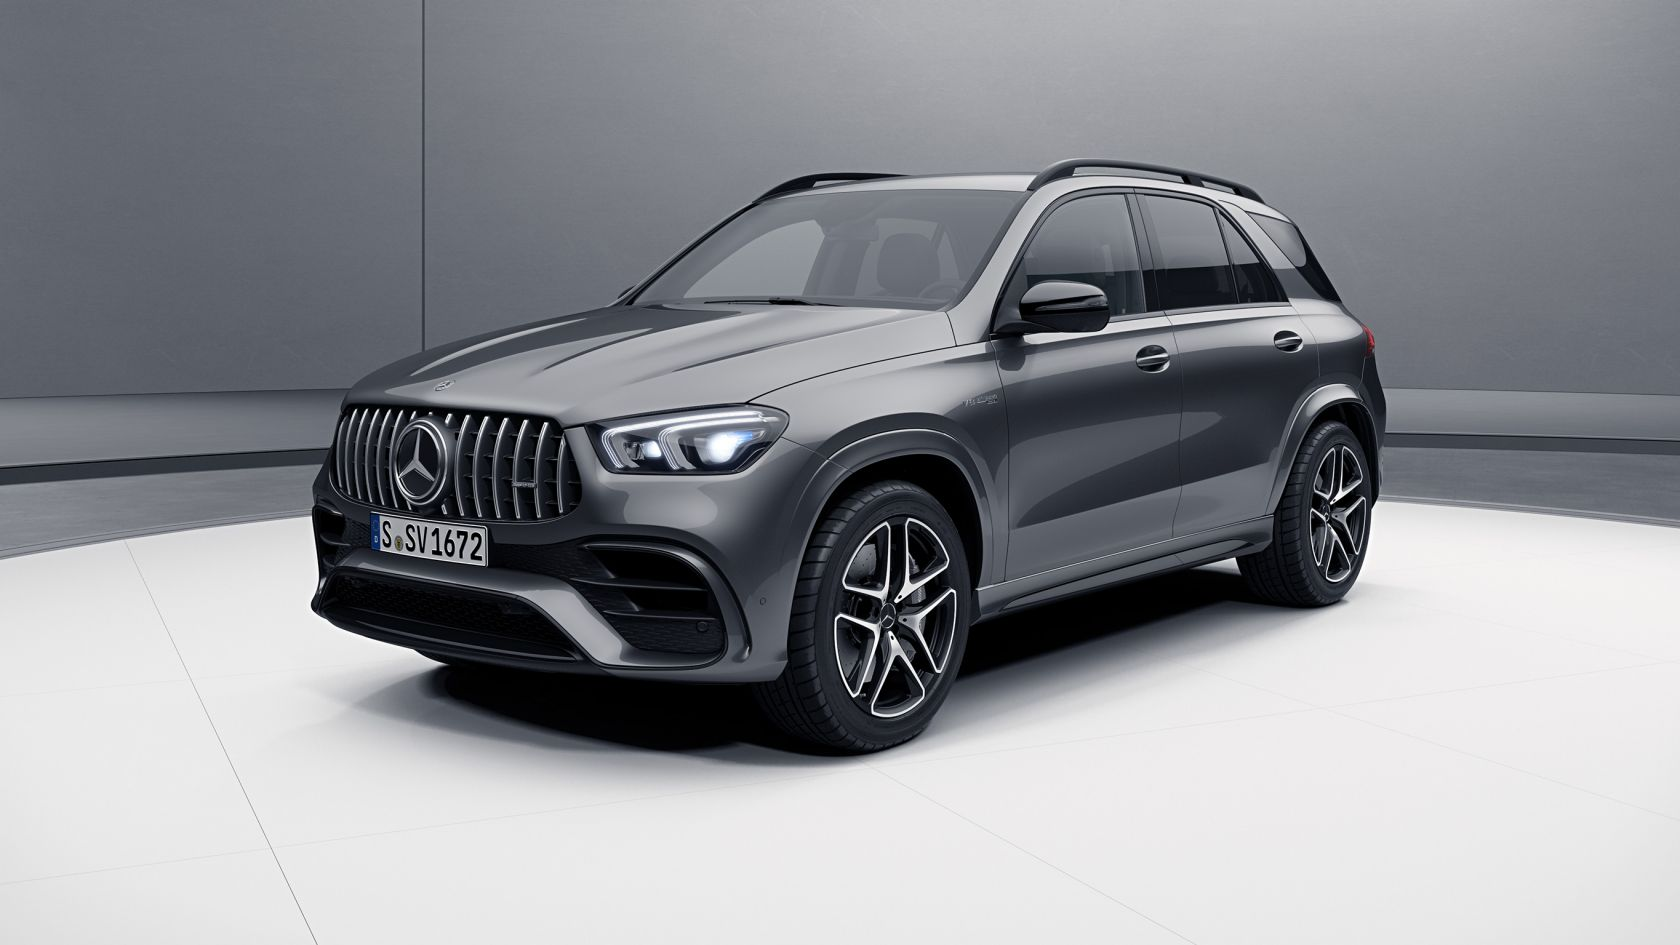 Mercedes-AMG GLE SUV